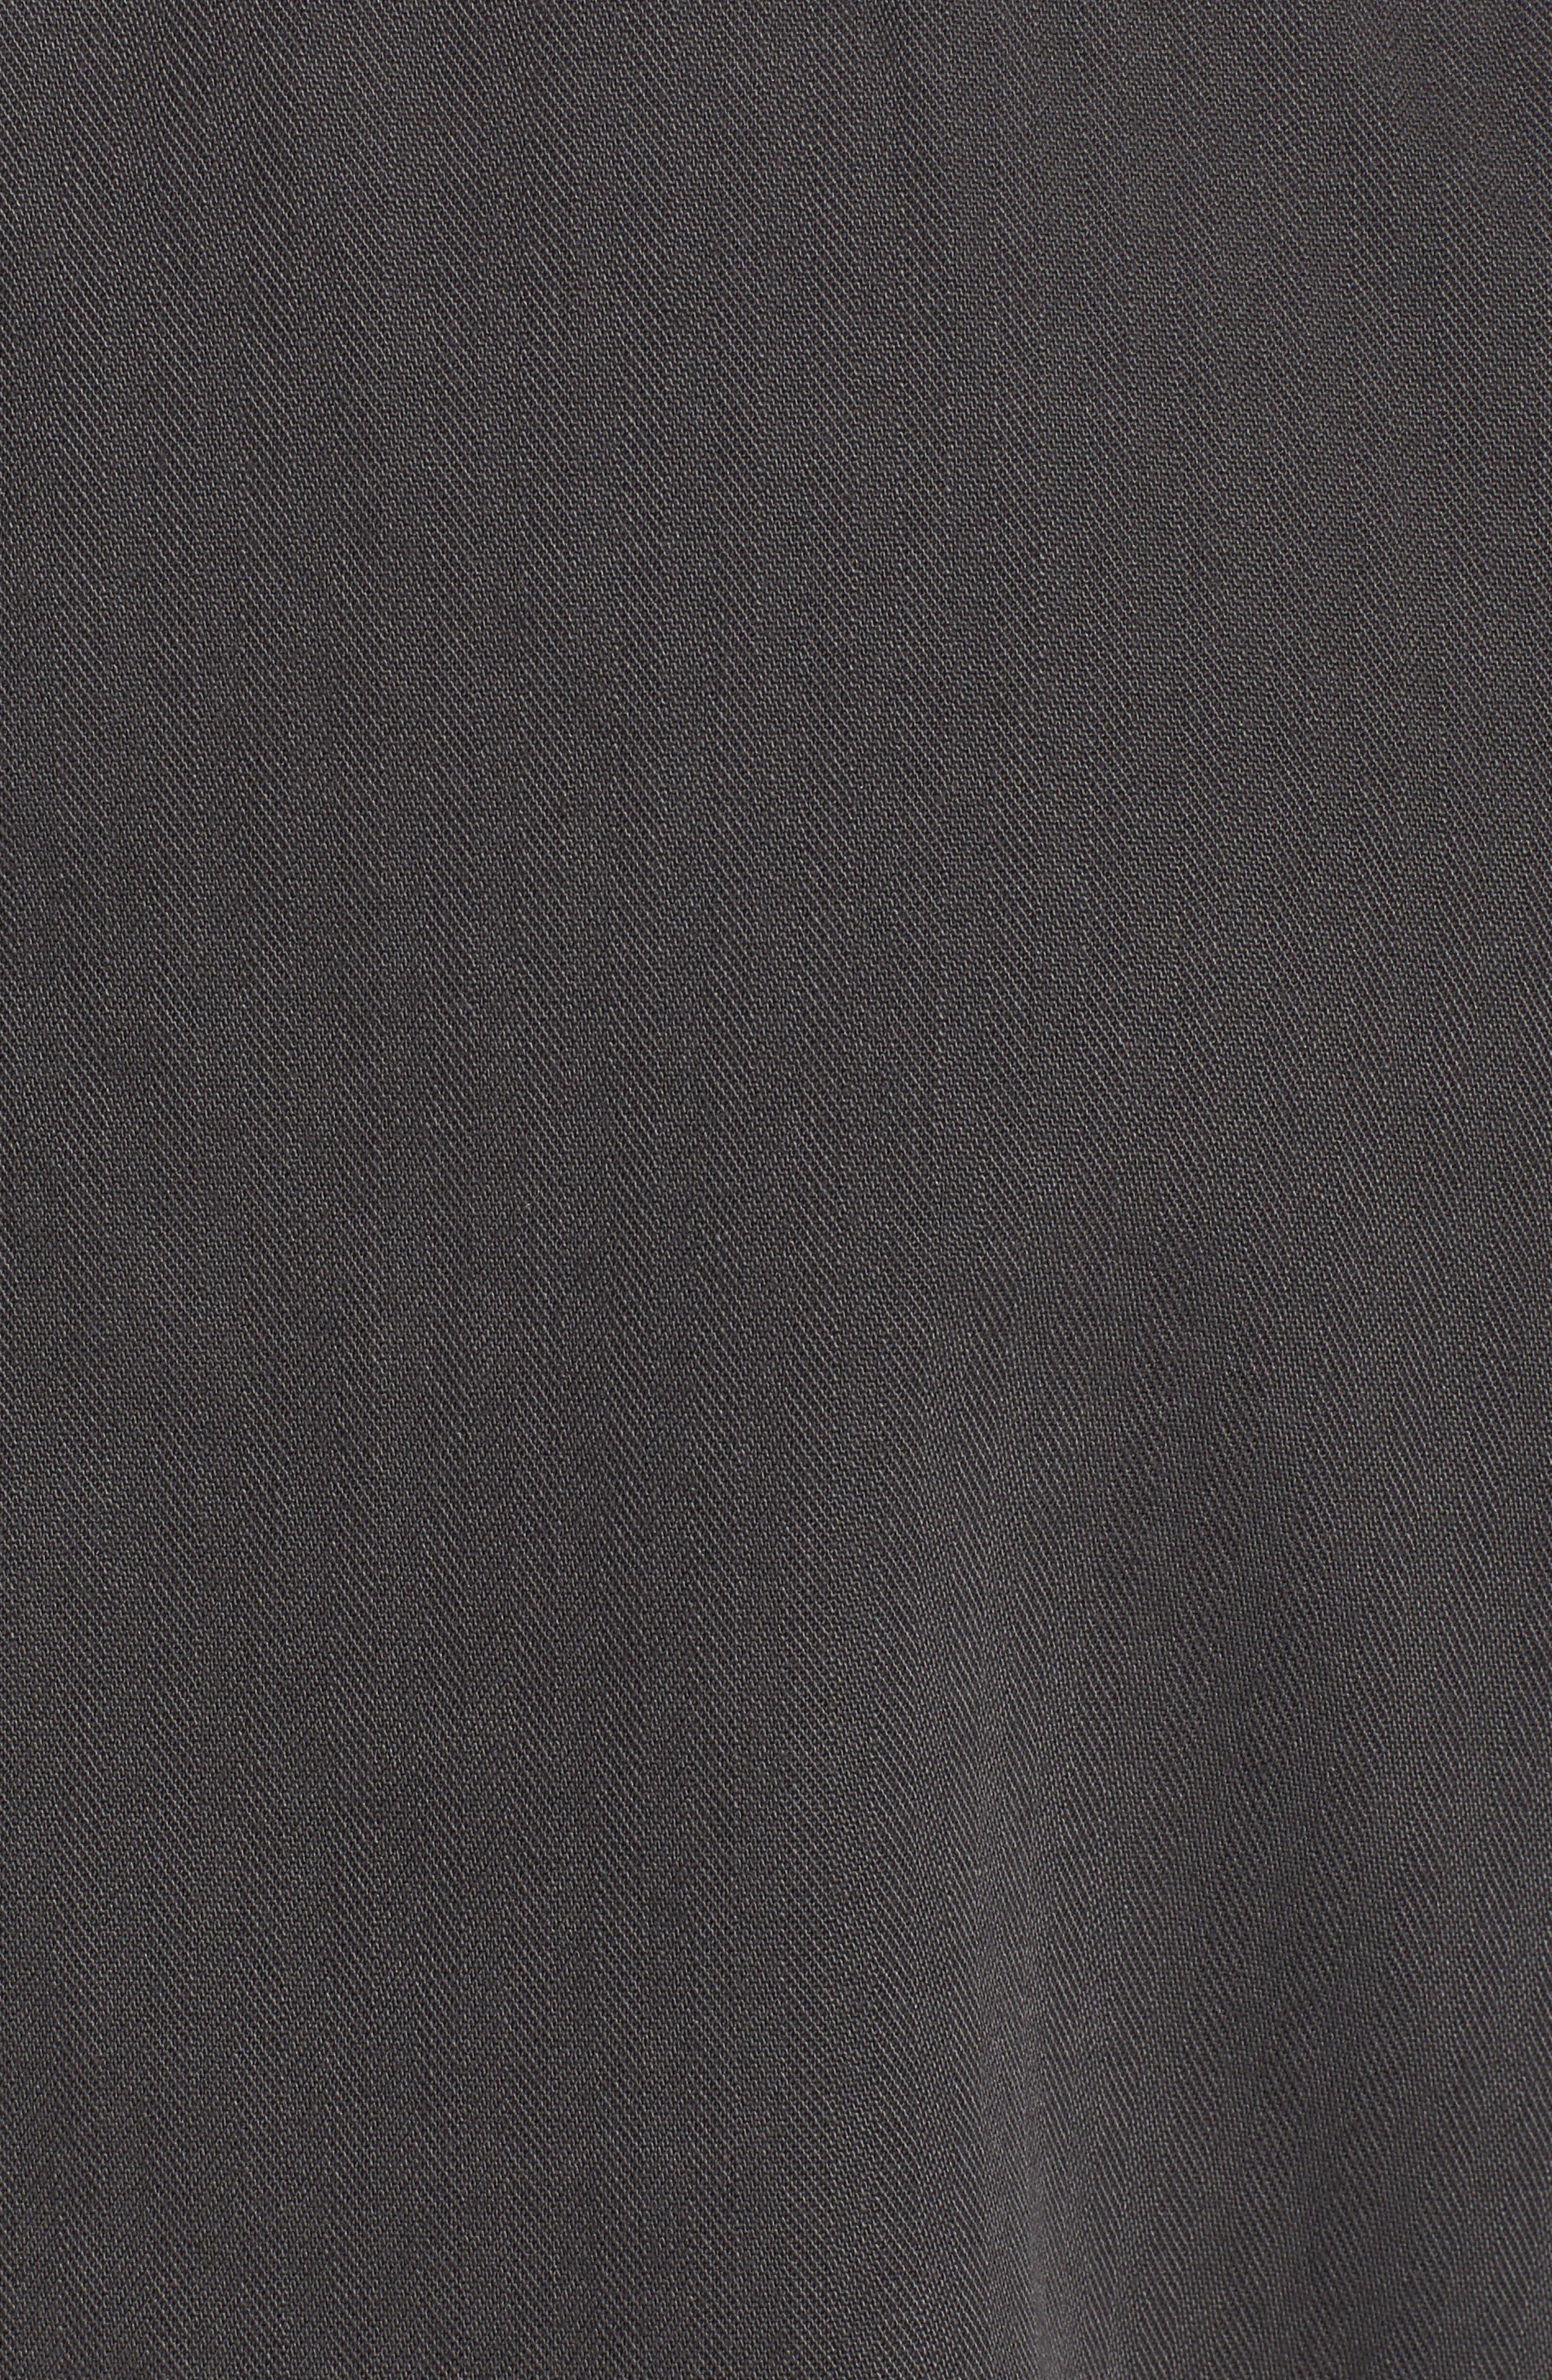 Marx Slim Fit Jacket,                             Alternate thumbnail 5, color,                             5 Years Pigment Smoke Grey